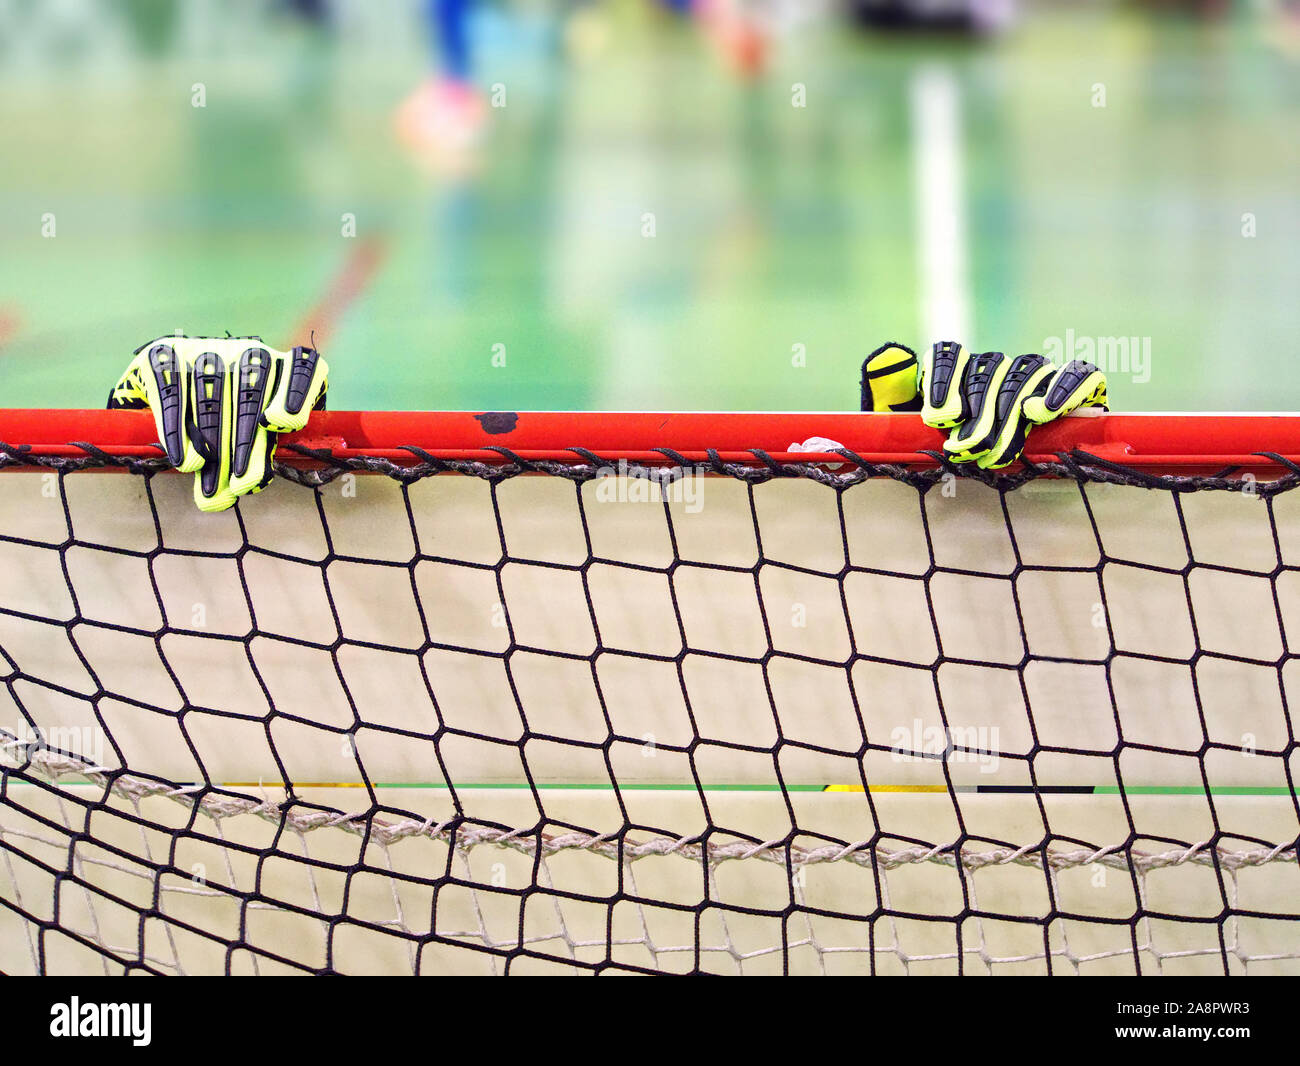 Portero guantes son sobre la viga del fútbol objetivo gate. Deportes detalle exacto con fondo borroso de junior match Foto de stock